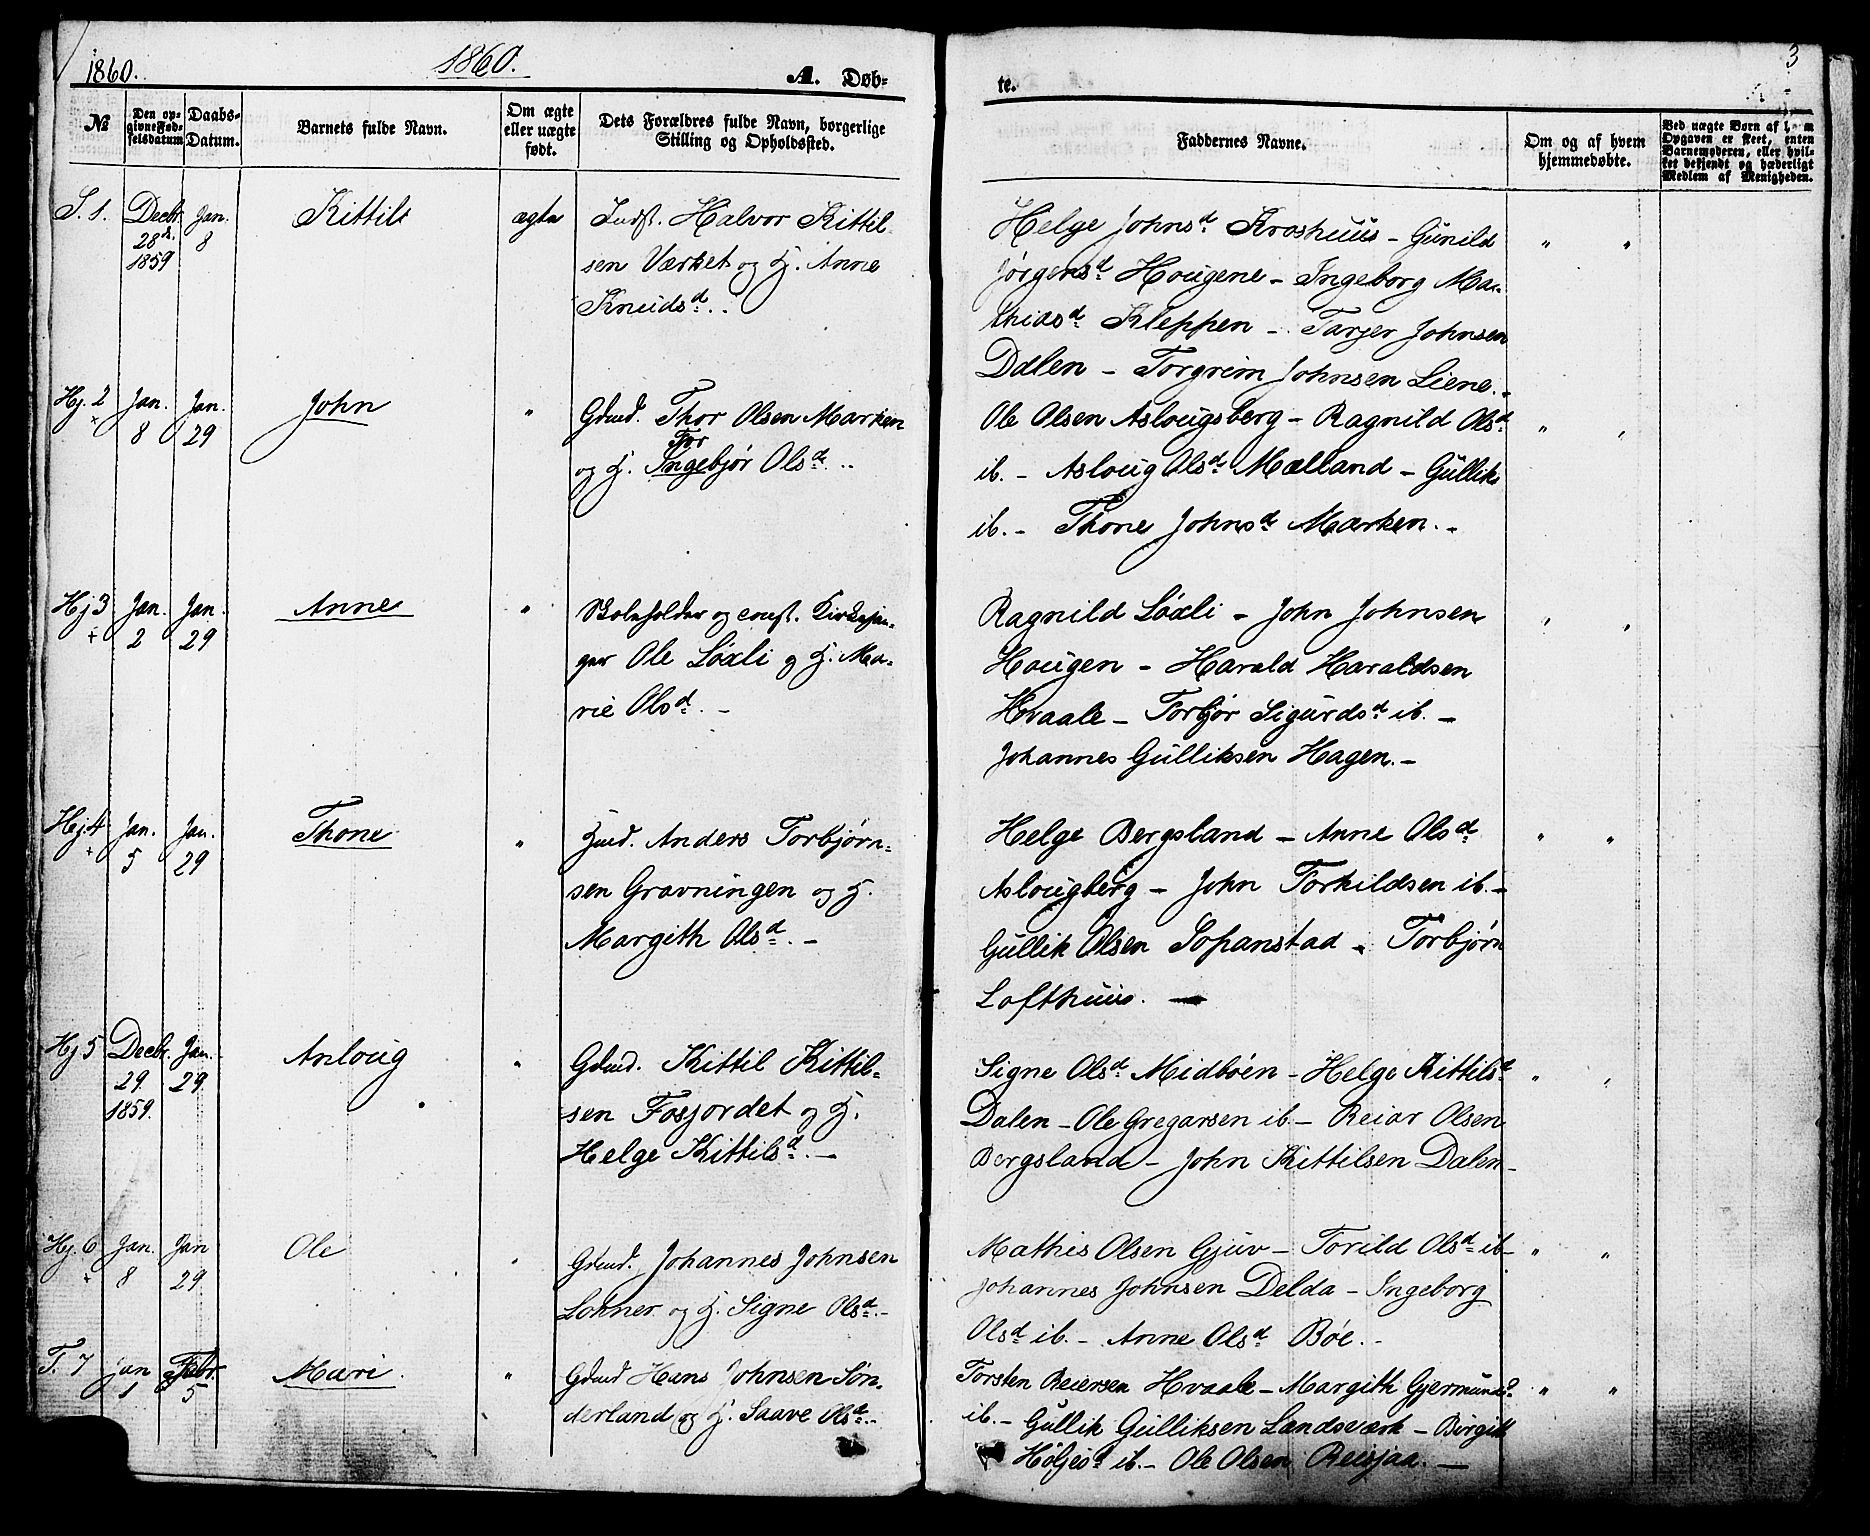 SAKO, Hjartdal kirkebøker, F/Fa/L0009: Ministerialbok nr. I 9, 1860-1879, s. 3